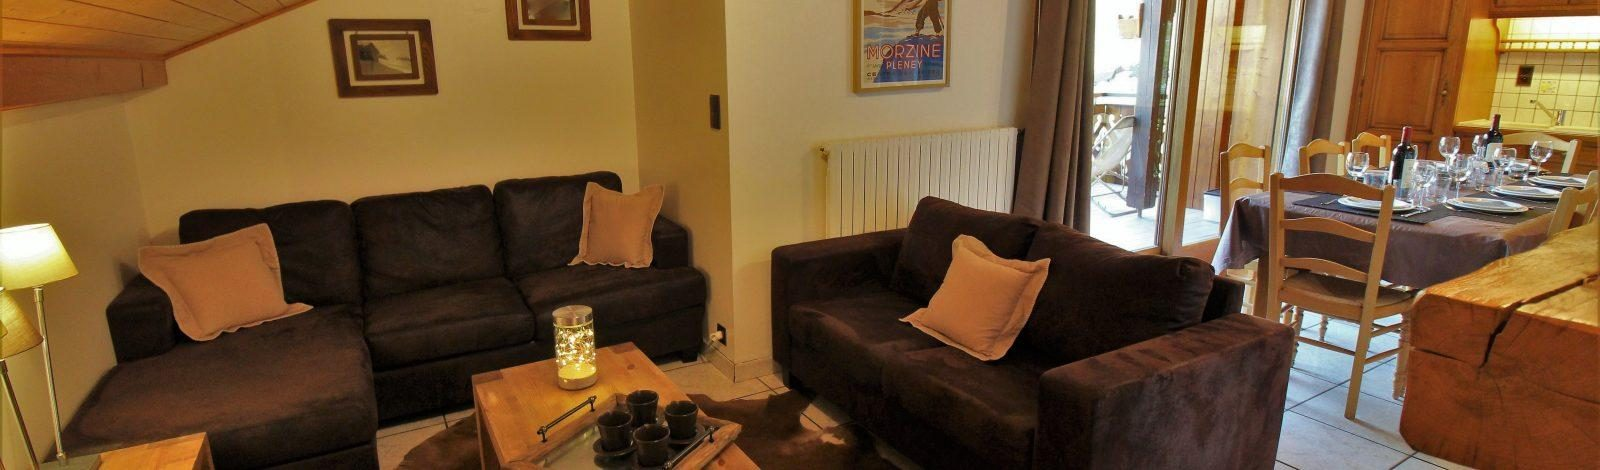 Apartment Edelweiss Banner 001